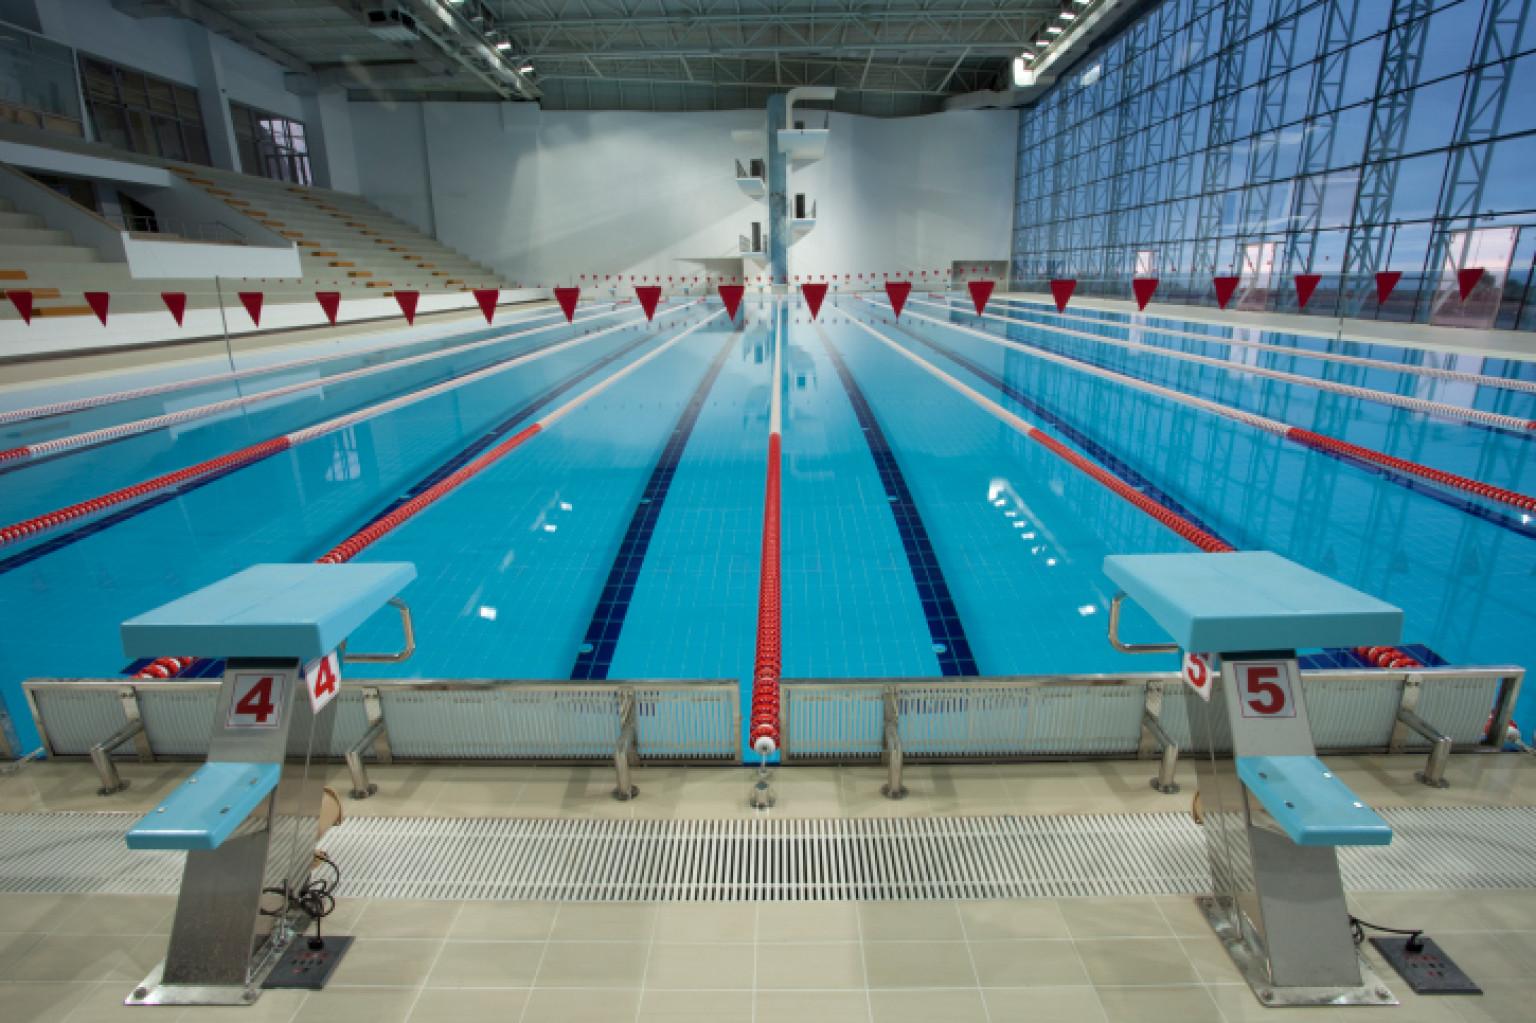 El primer ministro turco promete piscinas separadas por sexo - How many olympic sized swimming pools in uk ...